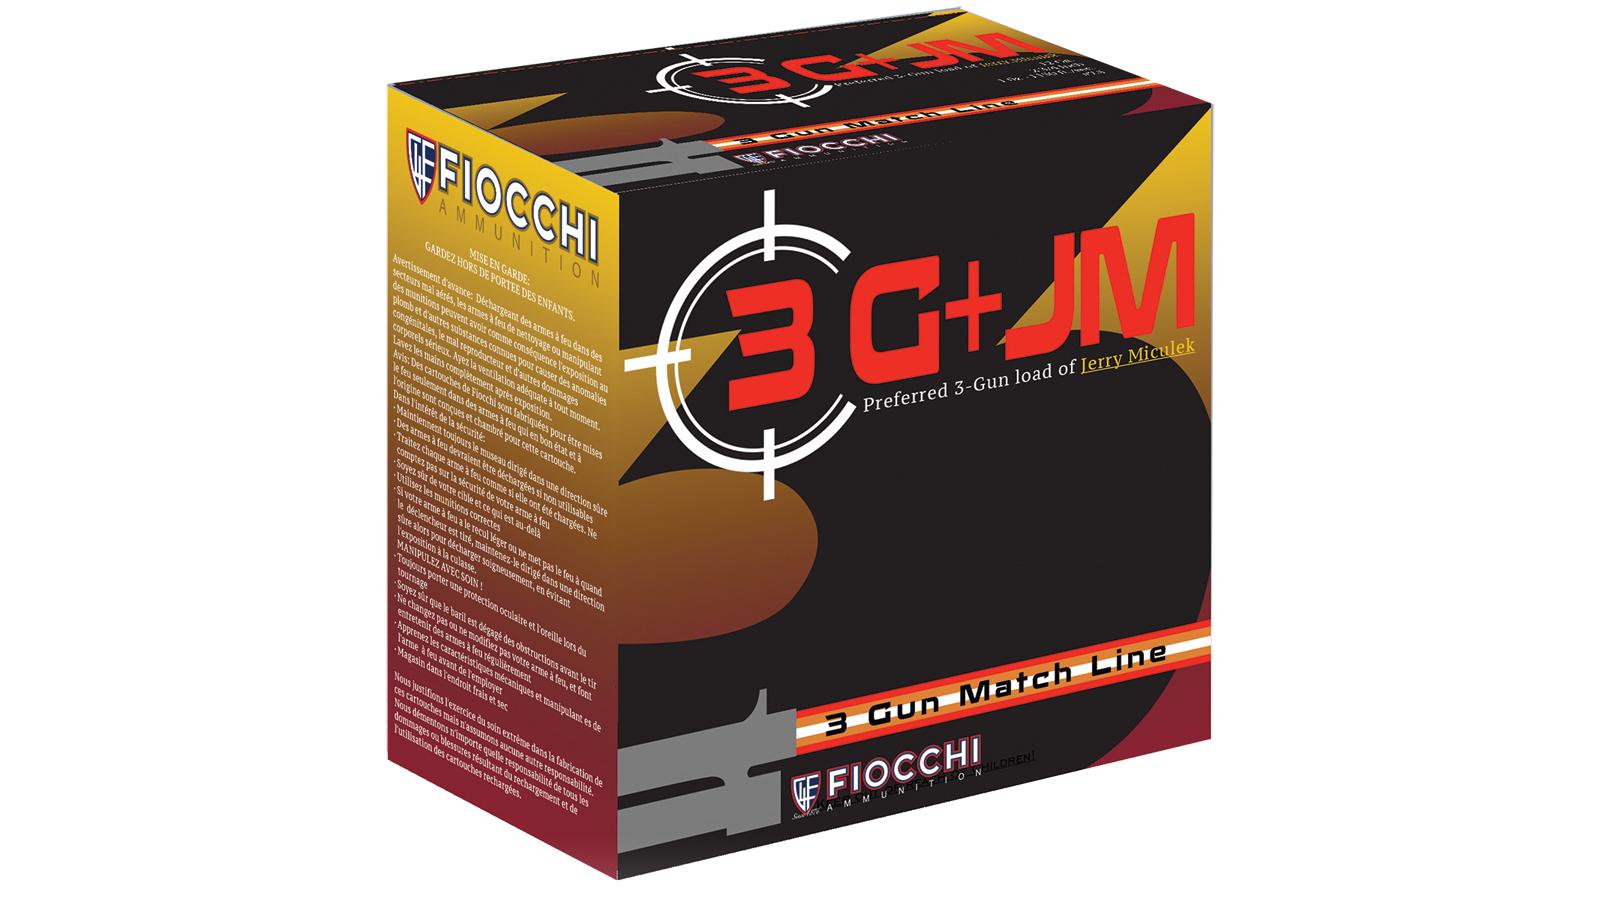 Fiocchi Ammo 12TL3G75 3 Gun 12 Gauge Match 12 Gauge, 2 3|4 in. , 1 oz, 7 1|2 Shot, 25 Rounds